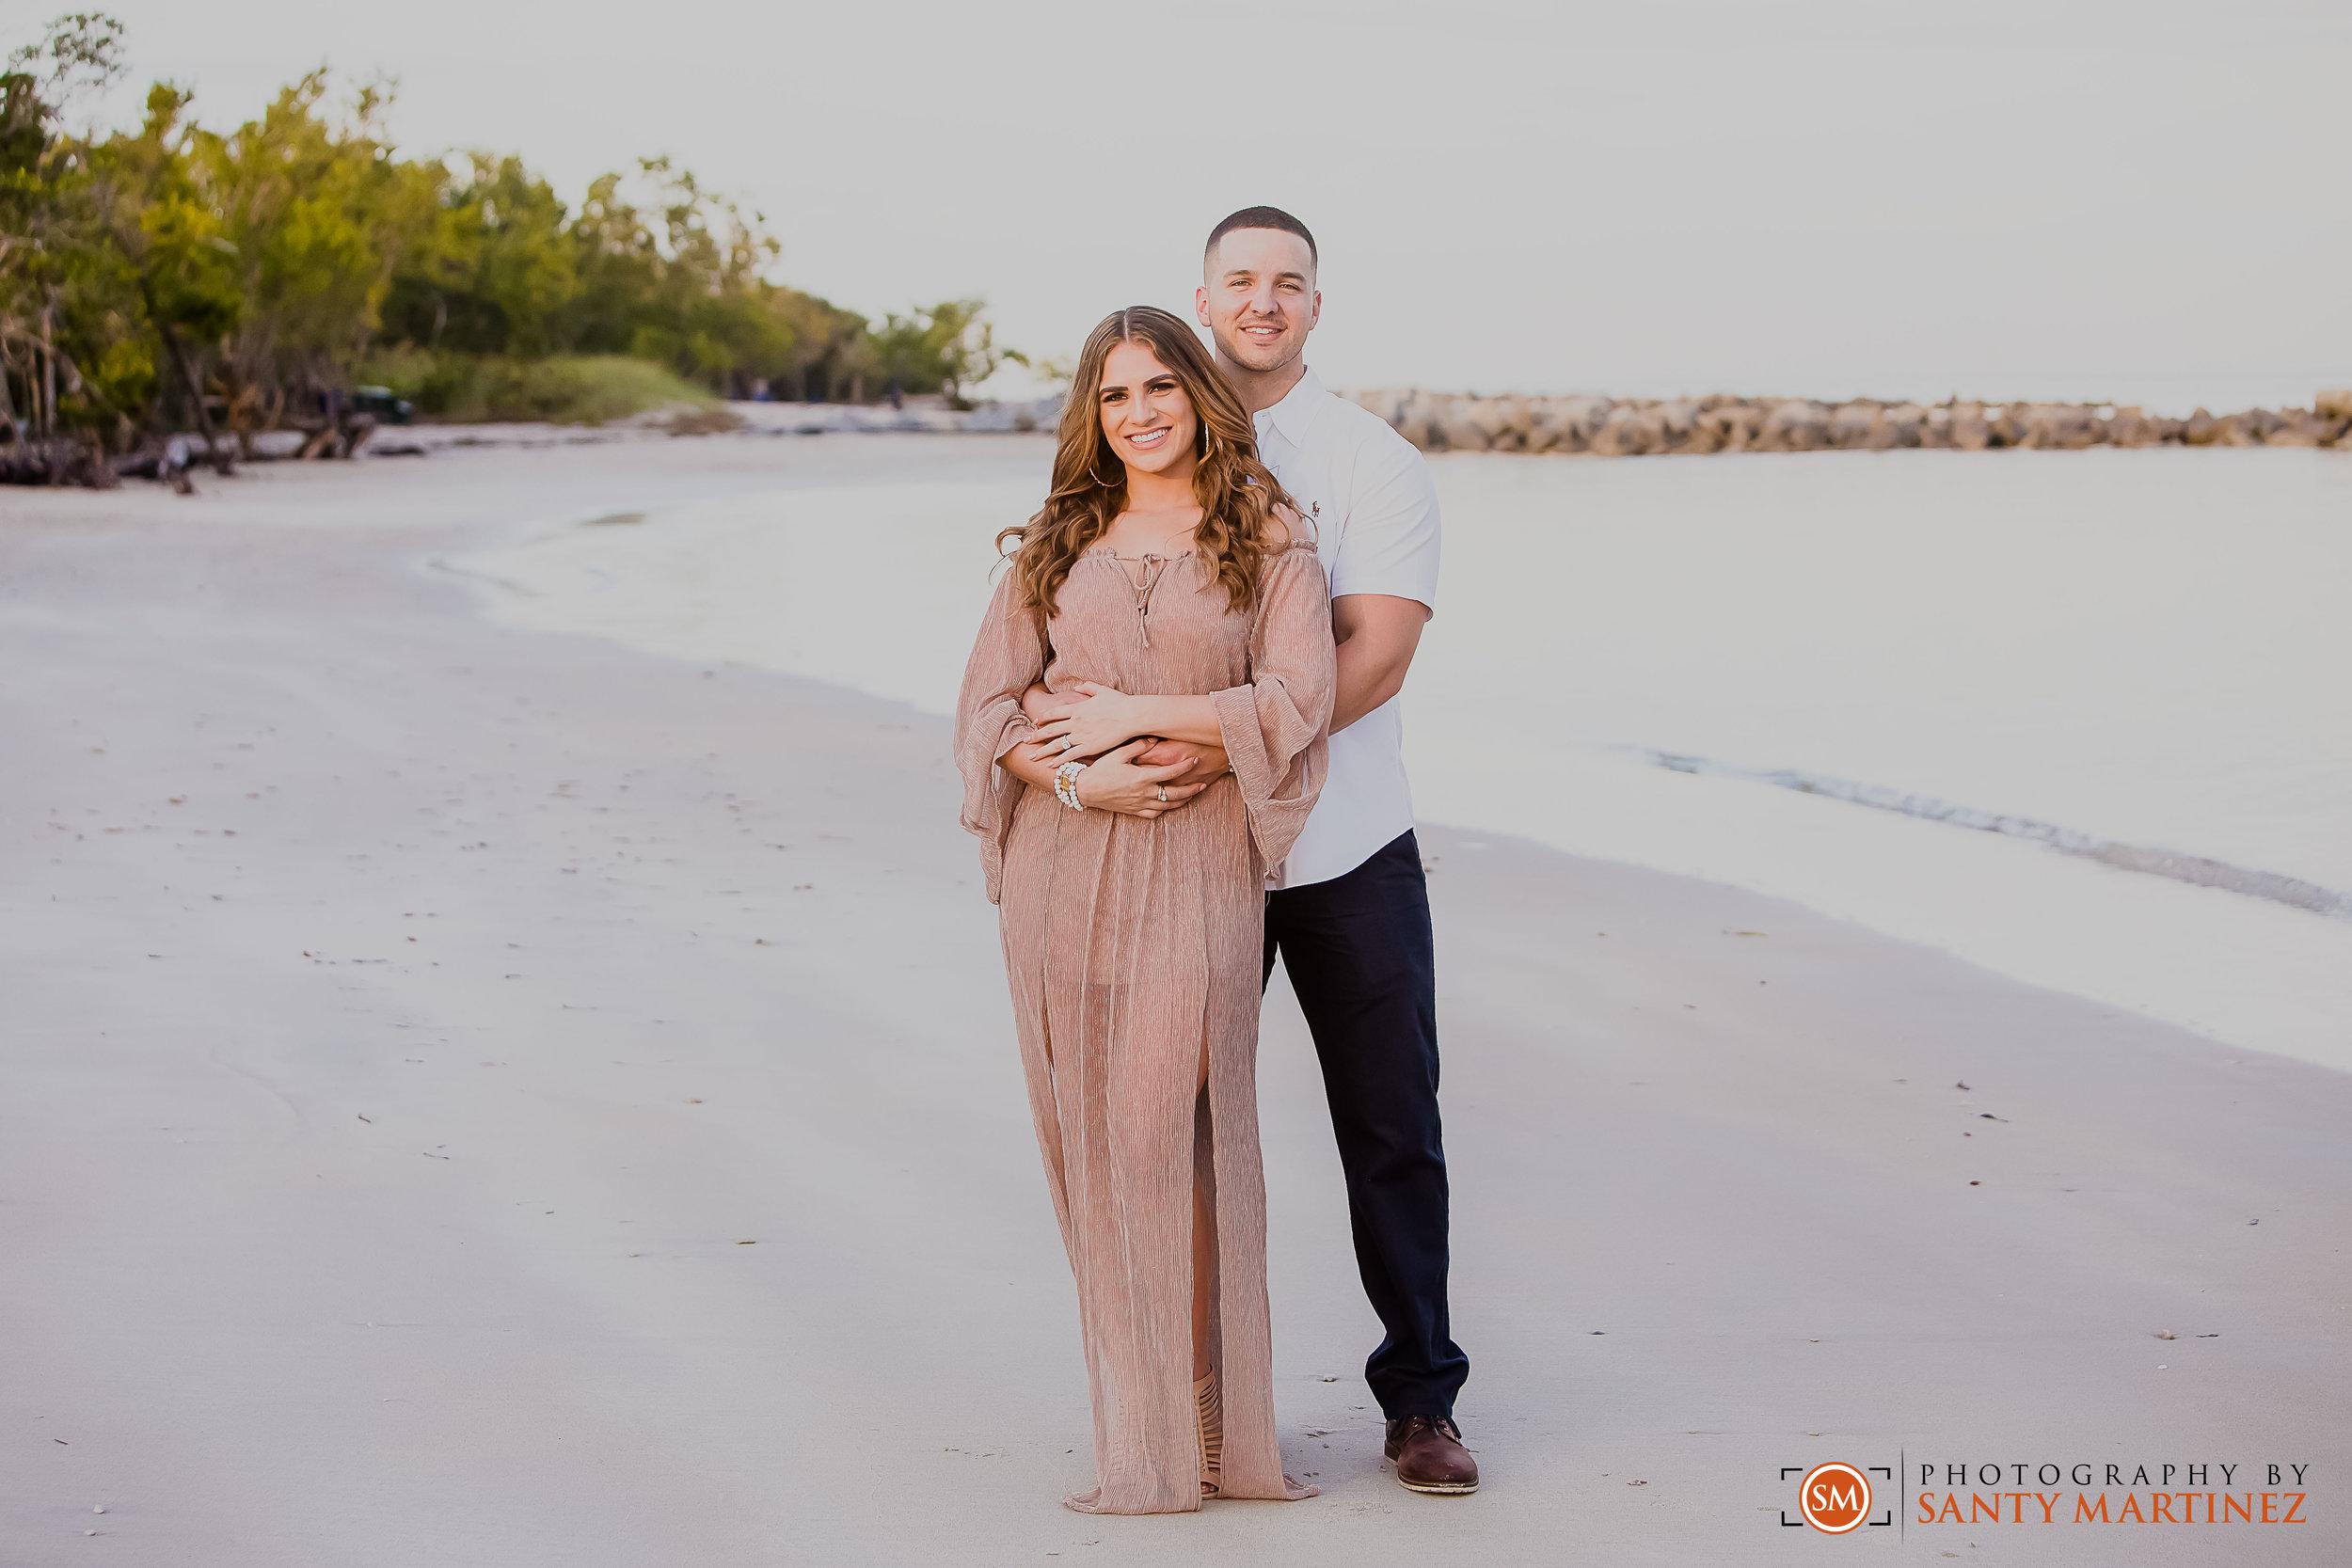 Miami Engagement Session - Key Biscayne - Photography by Santy Martinez-12.jpg